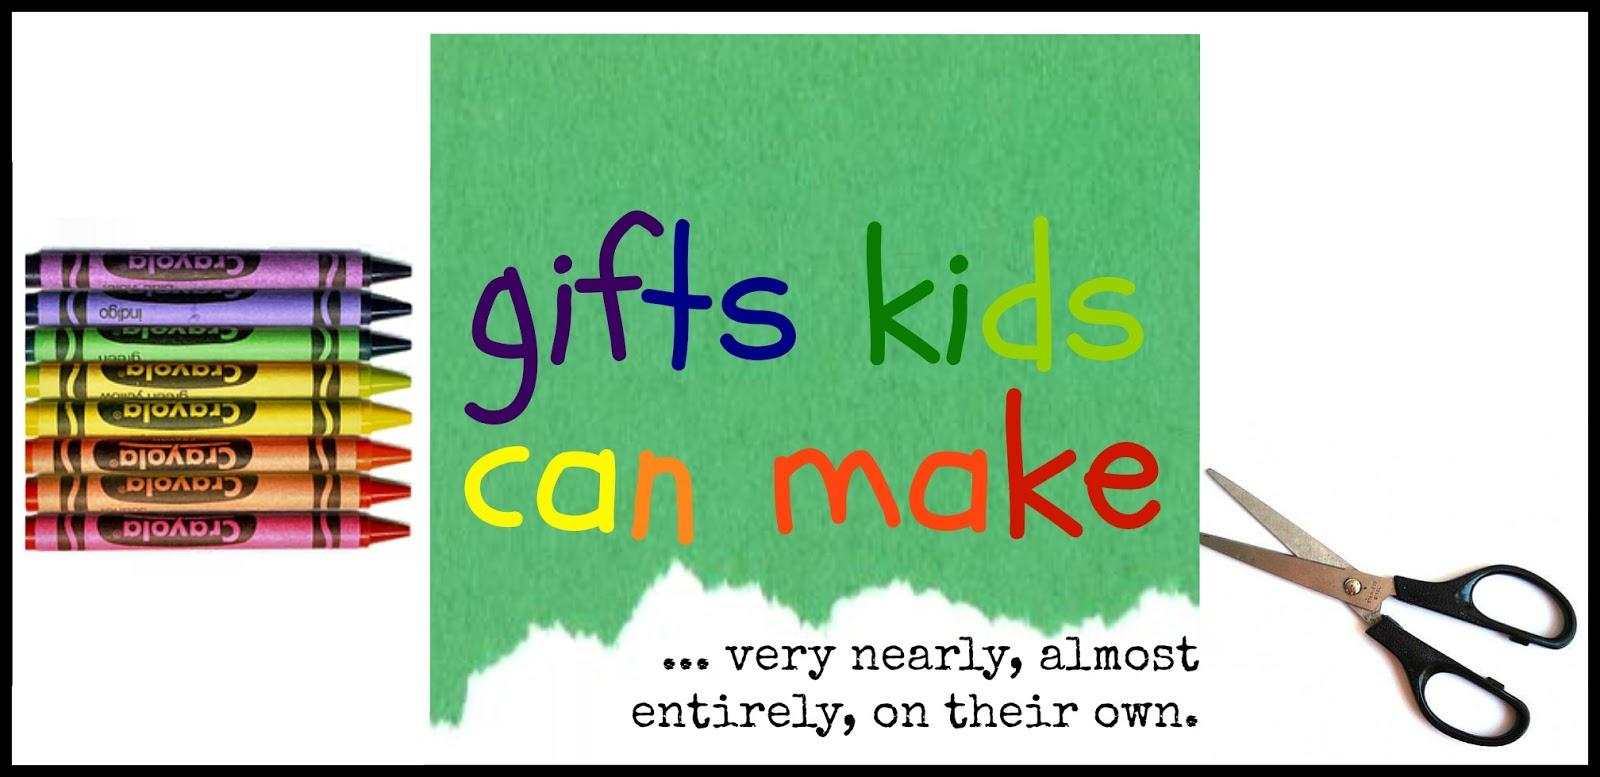 Homemade Christmas Gift Ideas For Kids To Make We may need to make    Homemade Christmas Gift Ideas For Kids To Make